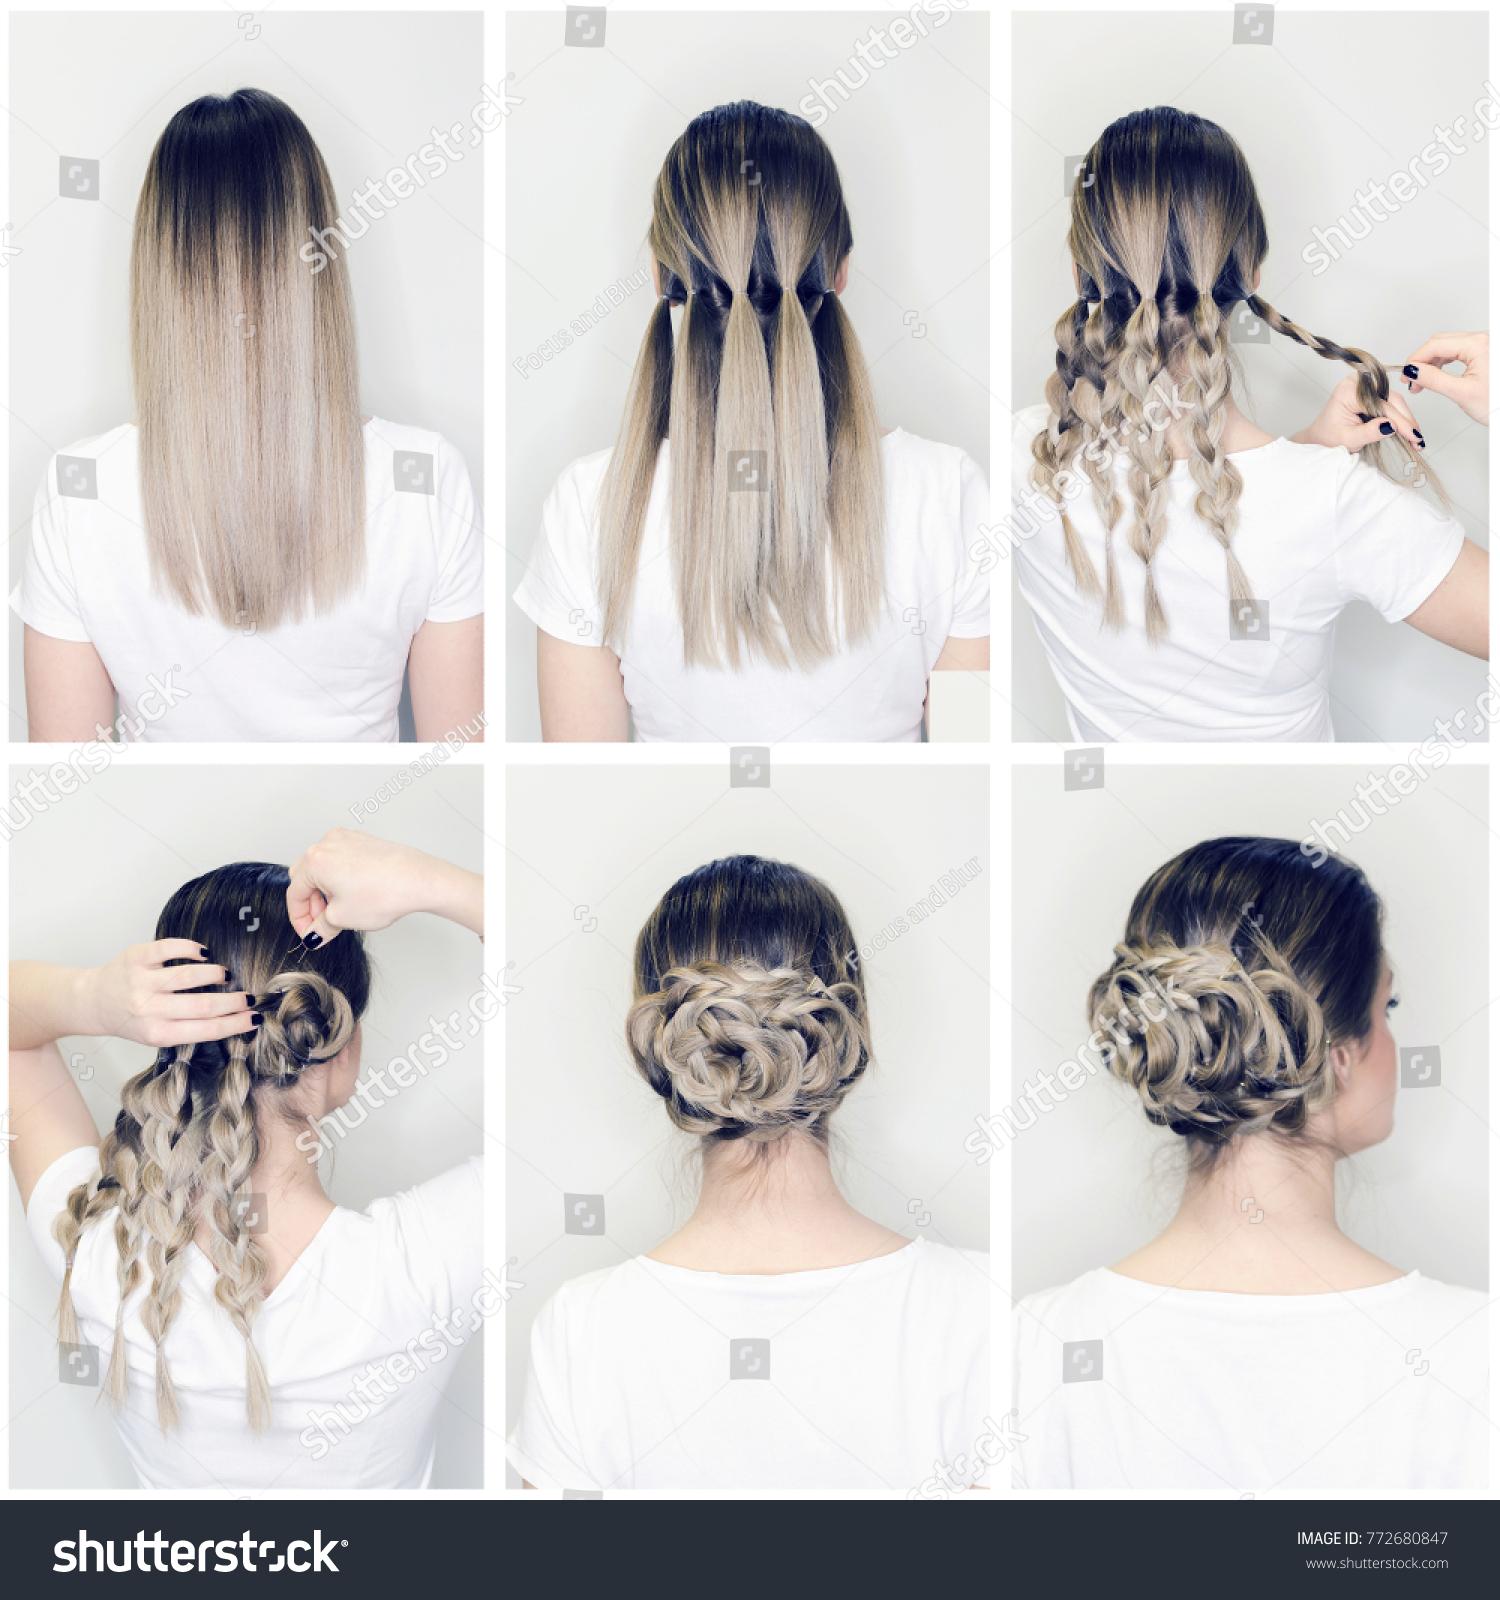 Elegant Updo Much Braids Hairstyle Tutorial Stock Photo Edit Now